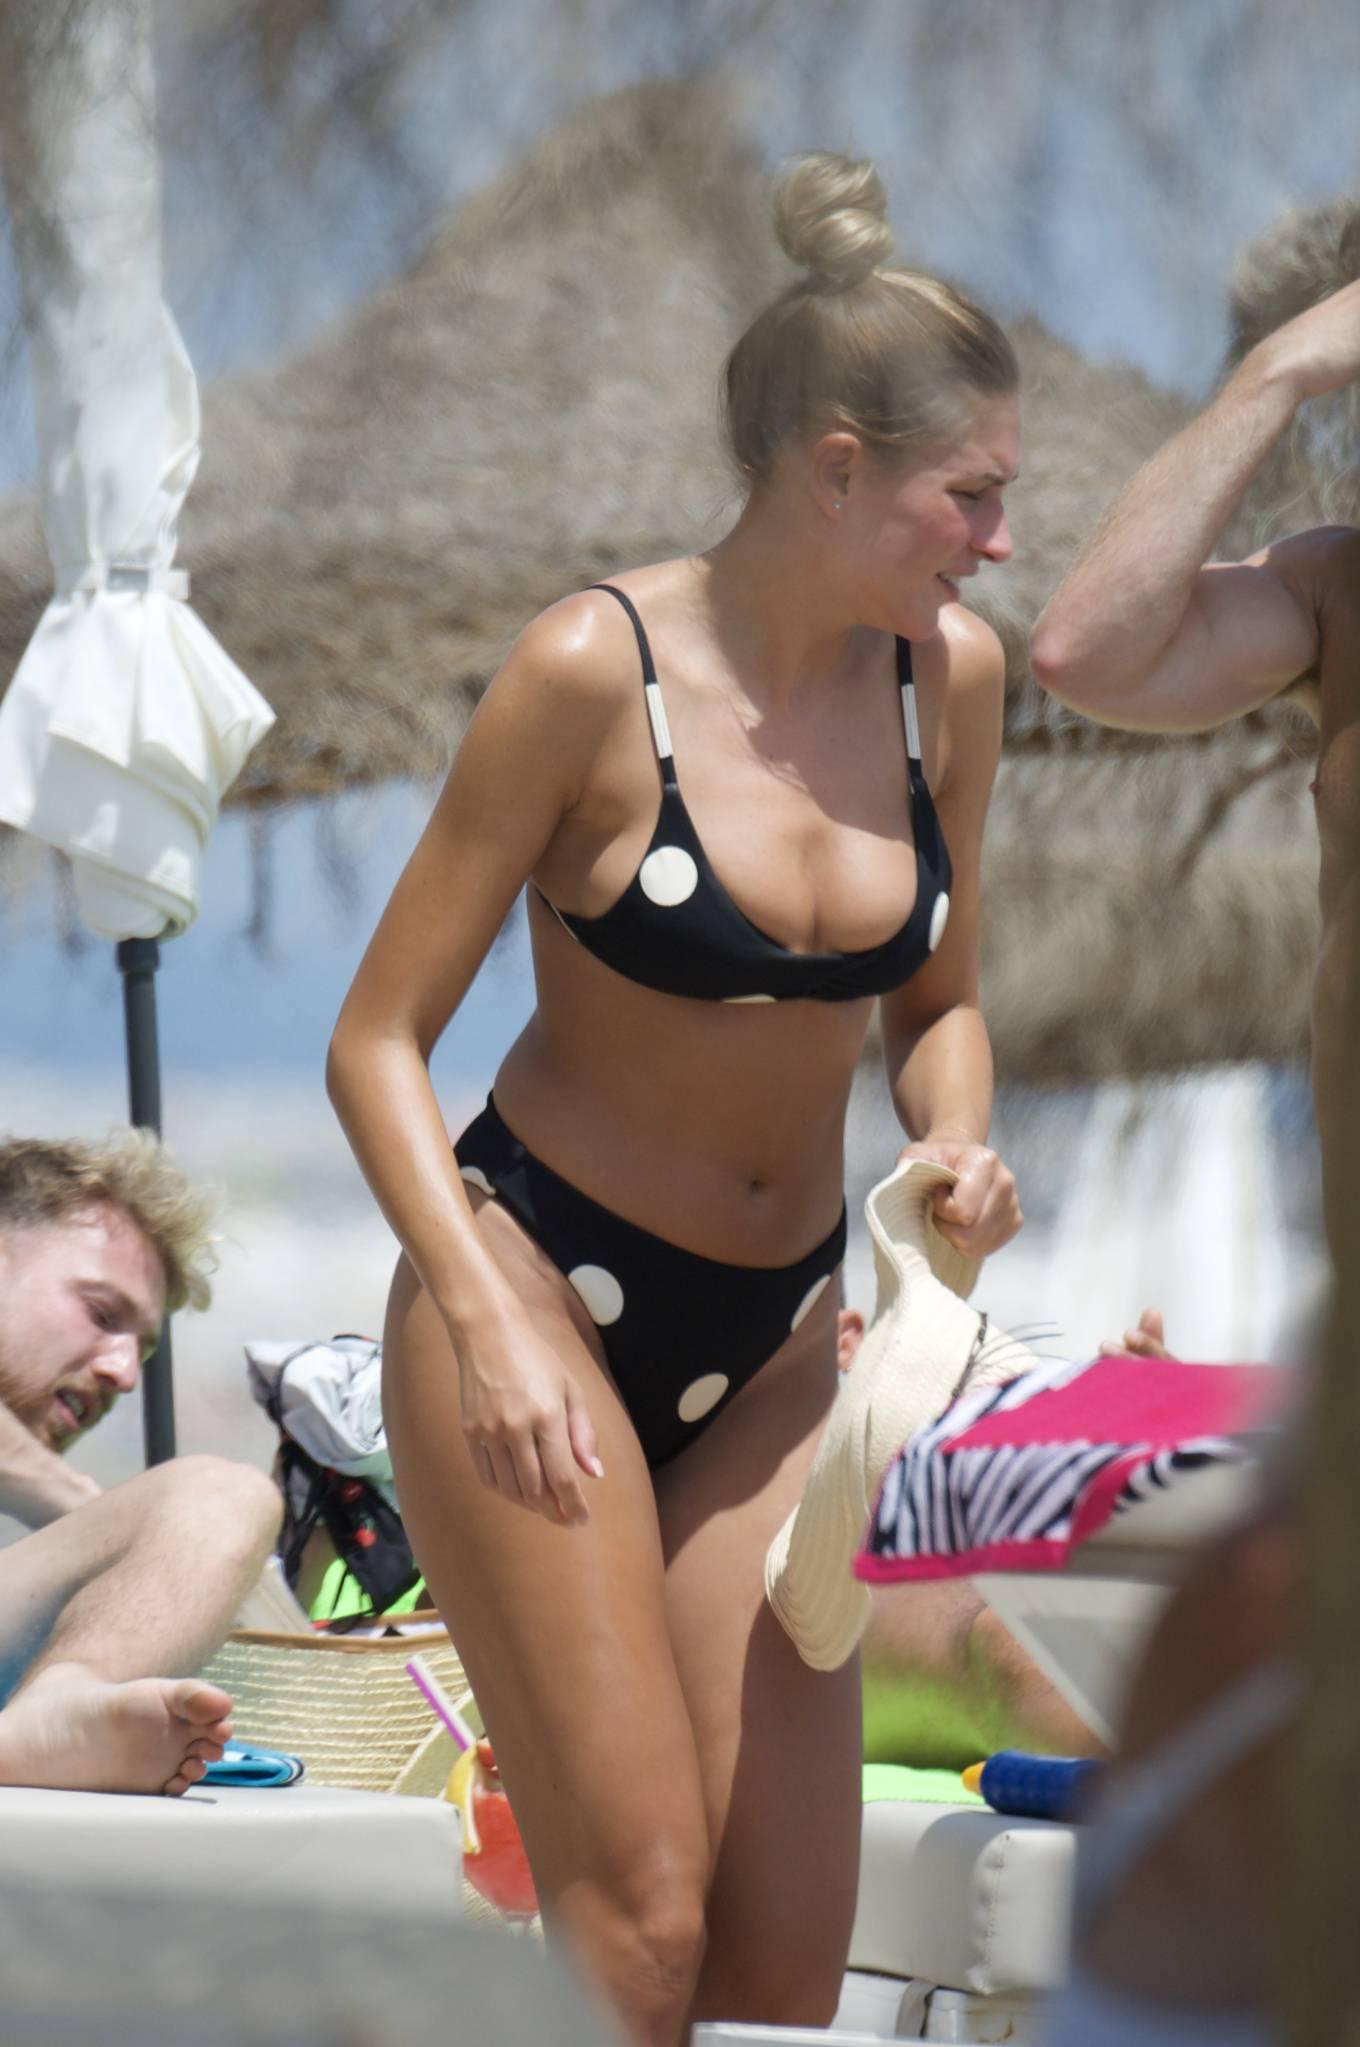 Zara McDermott 2020 : Zara McDermott in Bikini 2020-01